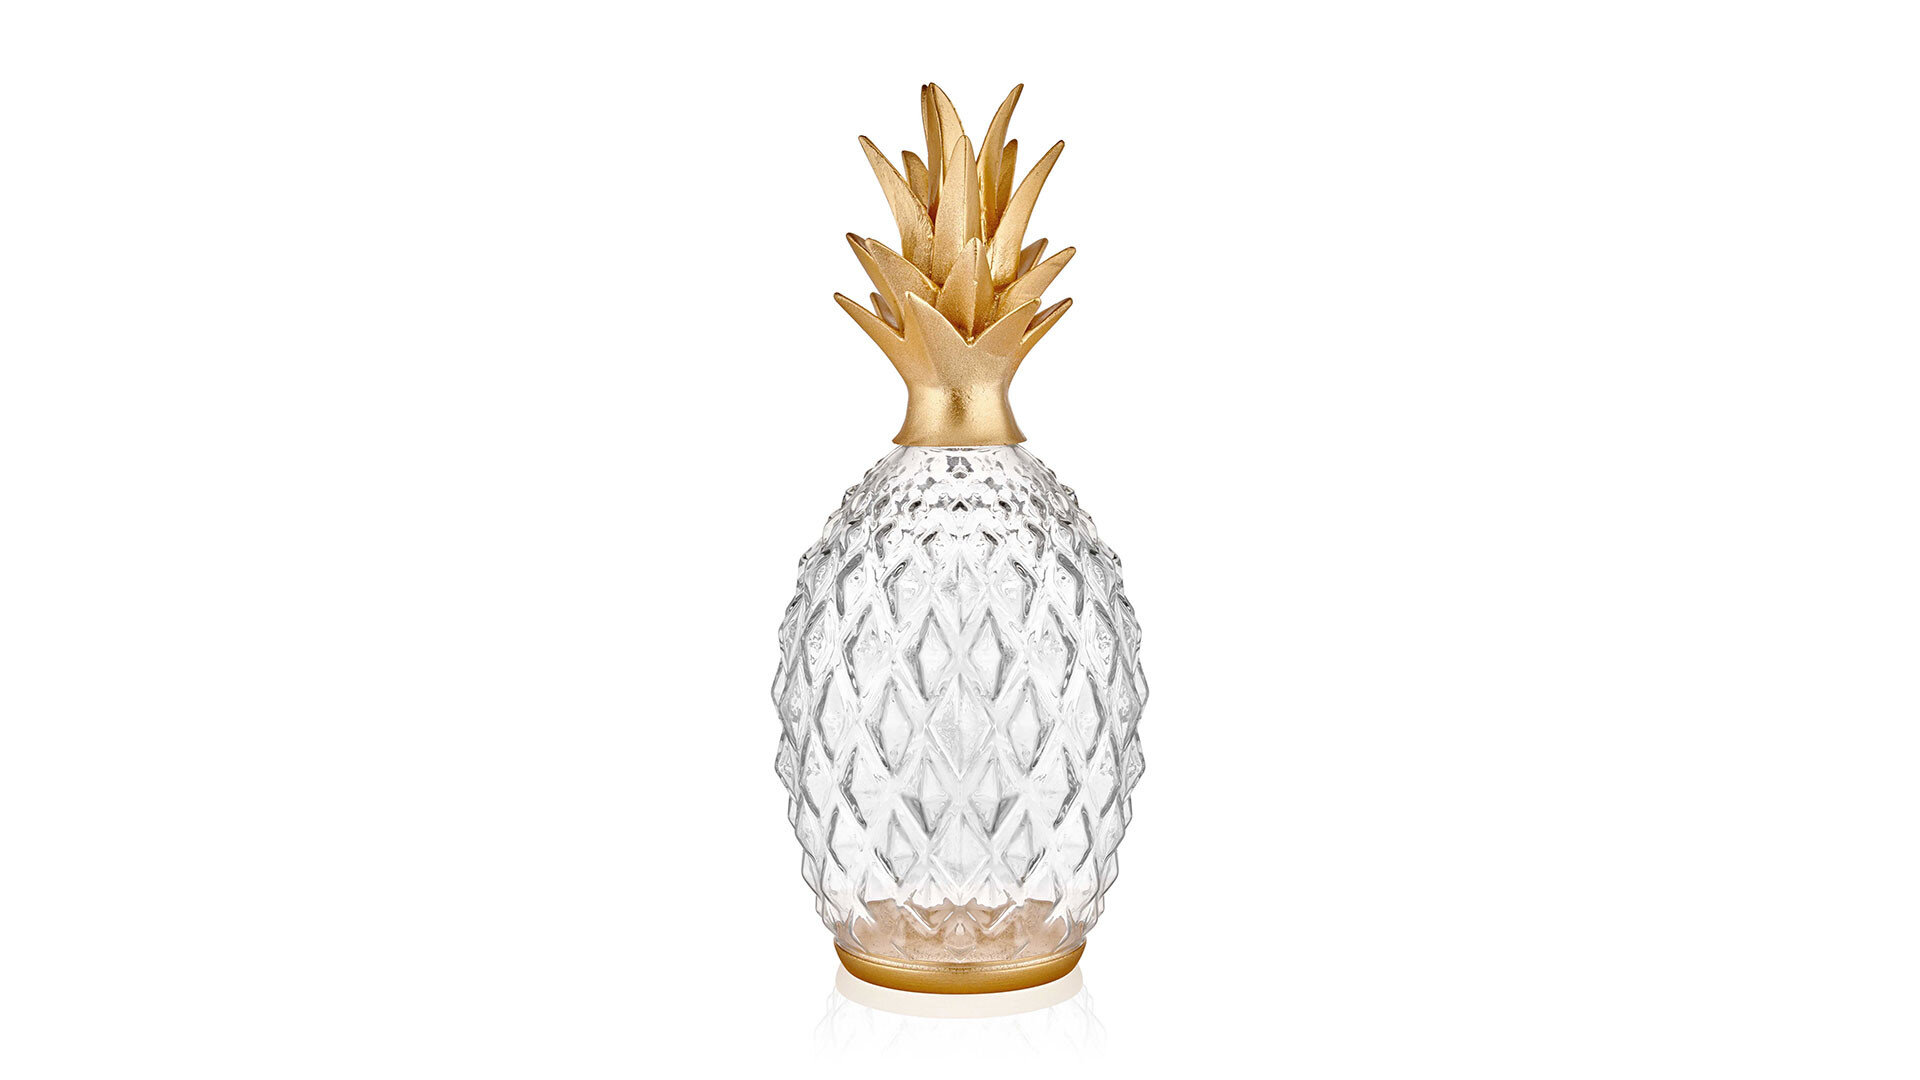 Diamond Decorative Glass Pineapple- Gold